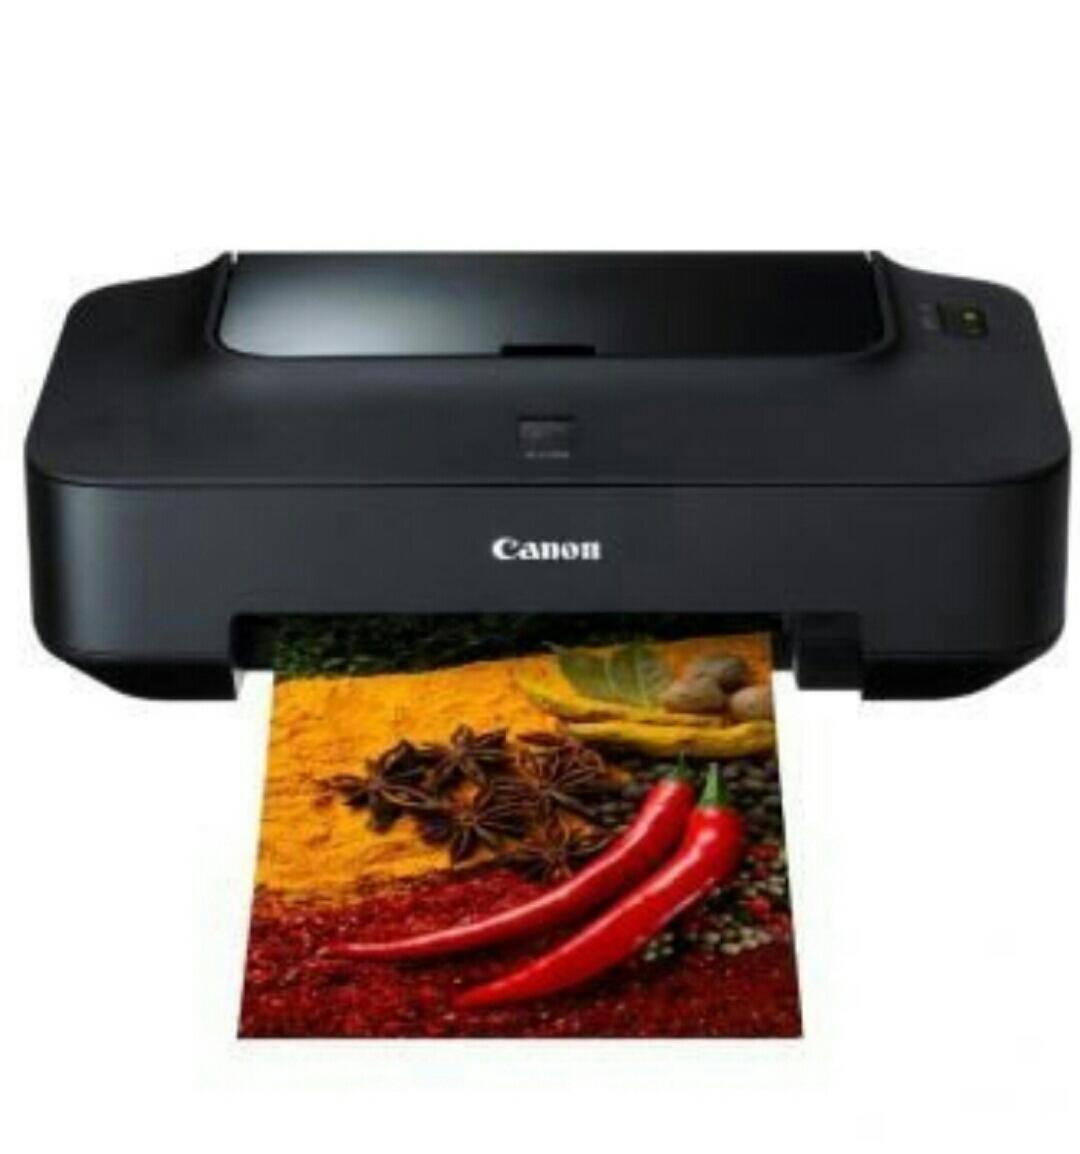 Printer canon ip2770 garansi resmi canon seindonesia